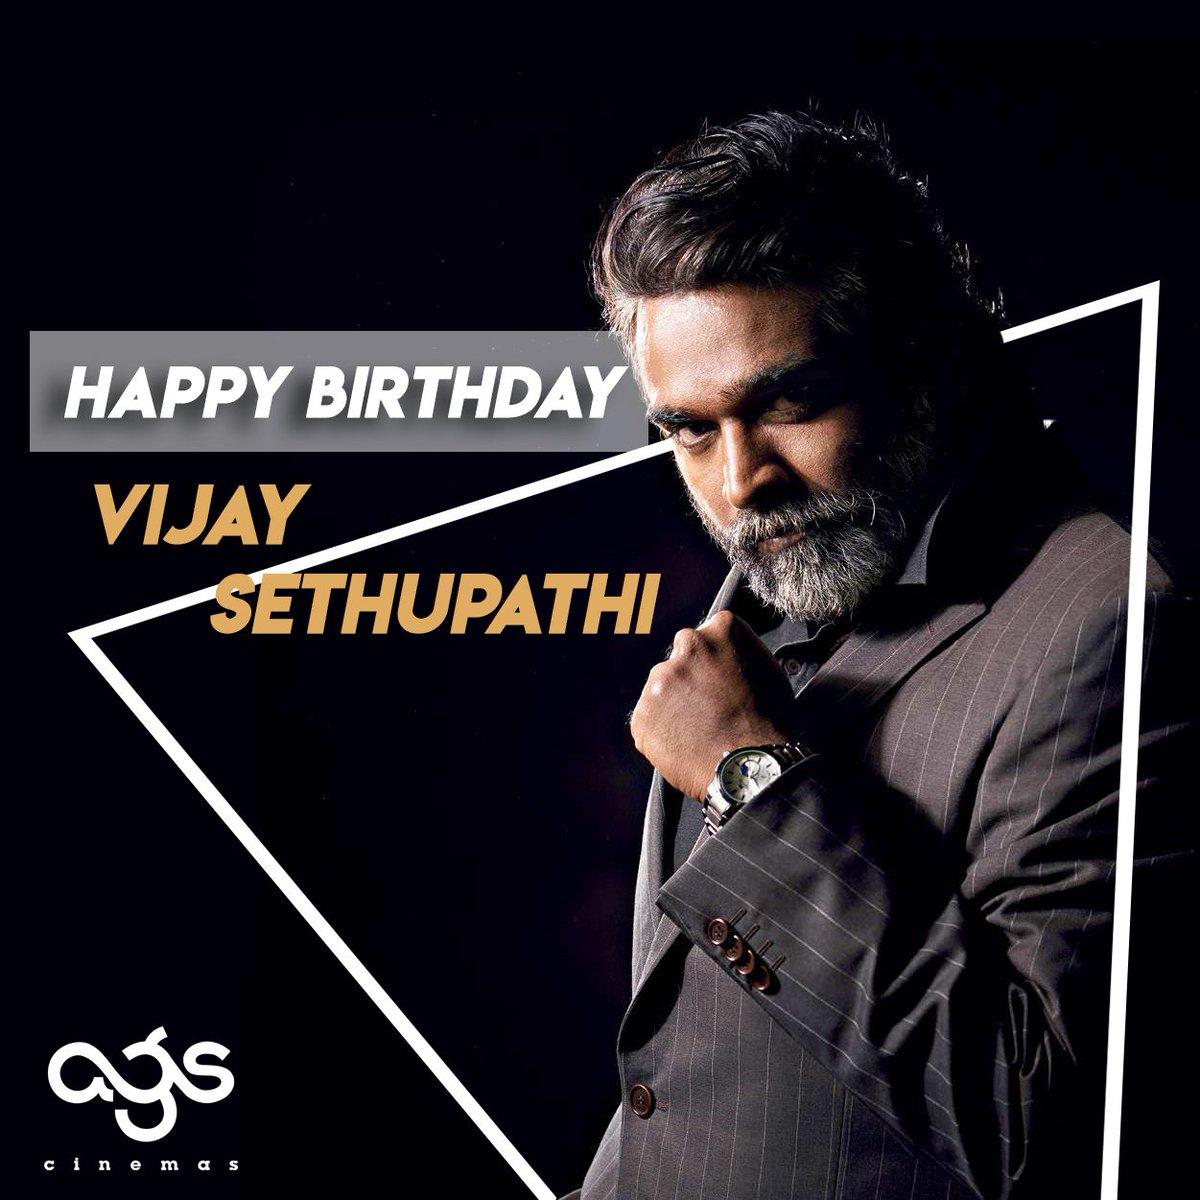 Wishing Makkal Selvan @VijaySethuOffl a very happy birthday!! #HBDVijaySethupathi